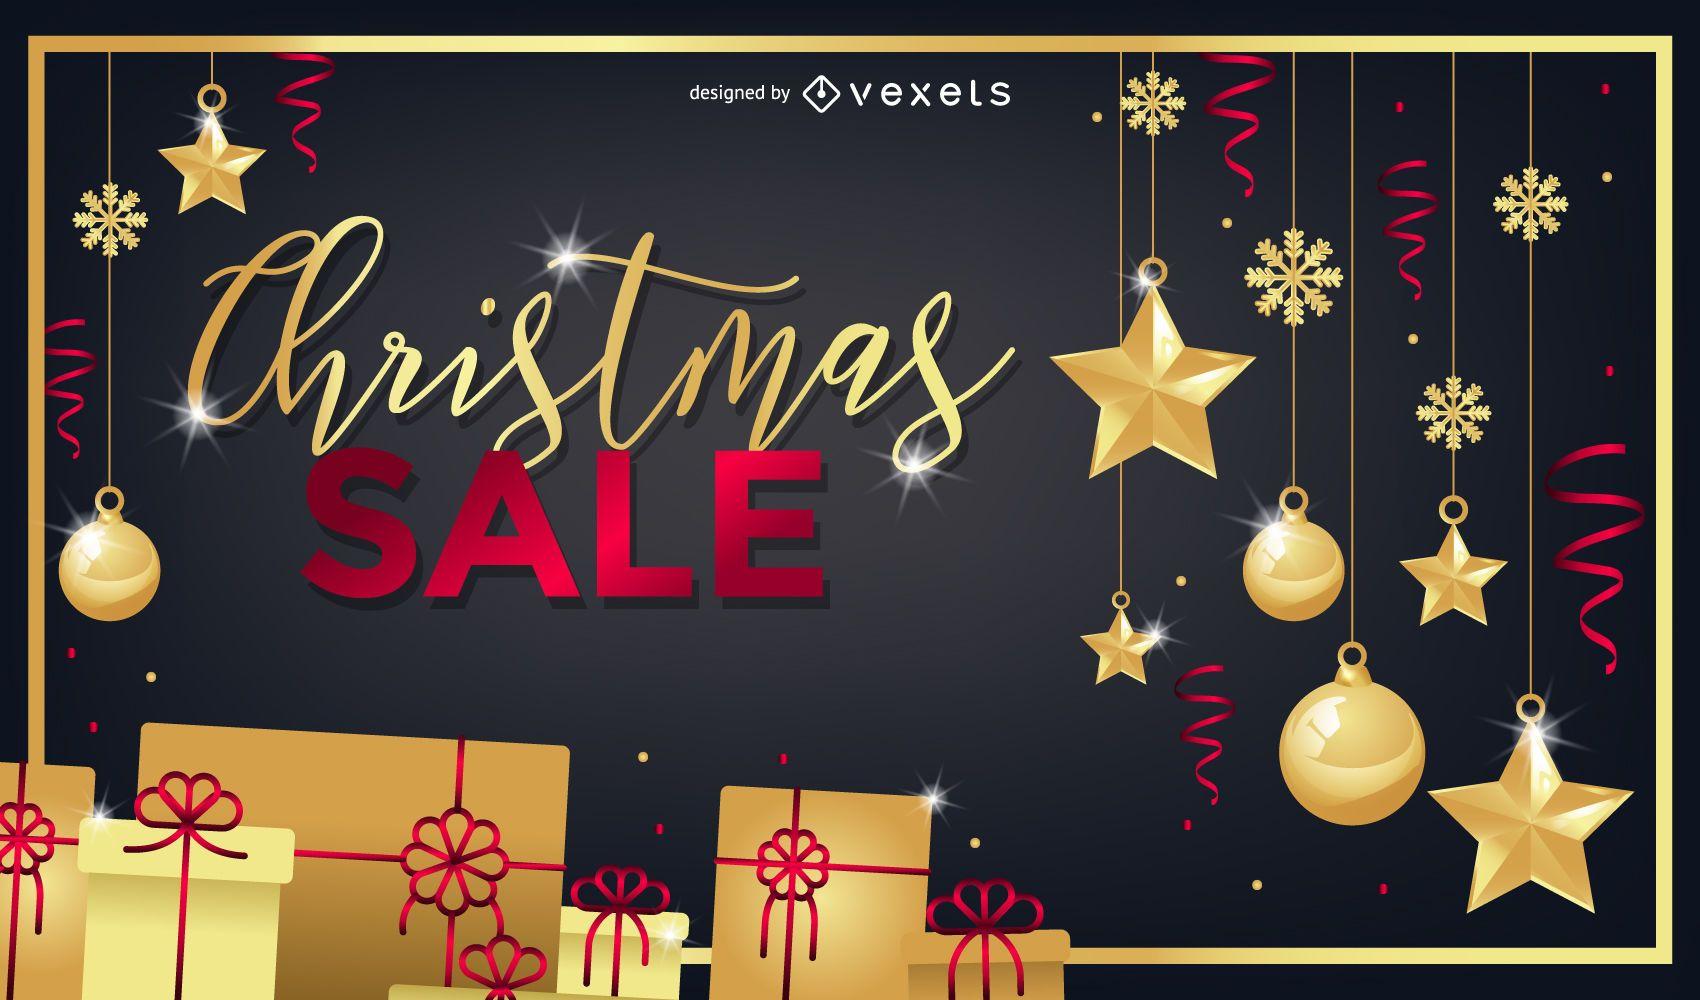 Christmas sale golden background